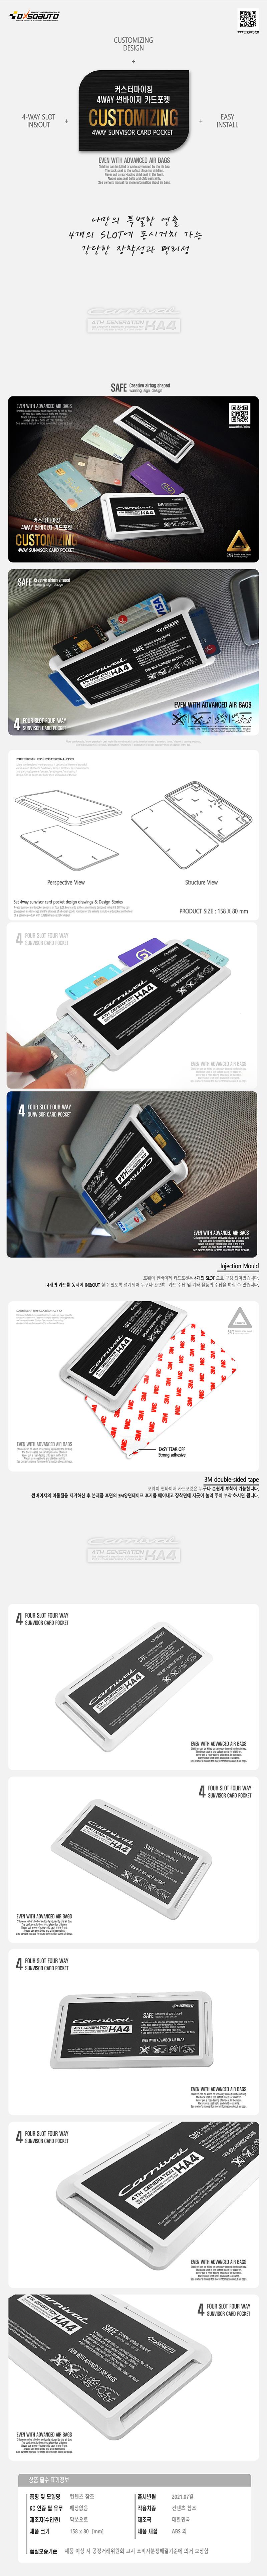 [DXSOAUTO] 커스터마이징 4WAY 썬바이저 카드포켓 (1EA / 1SET) 카니발KA4 화이트